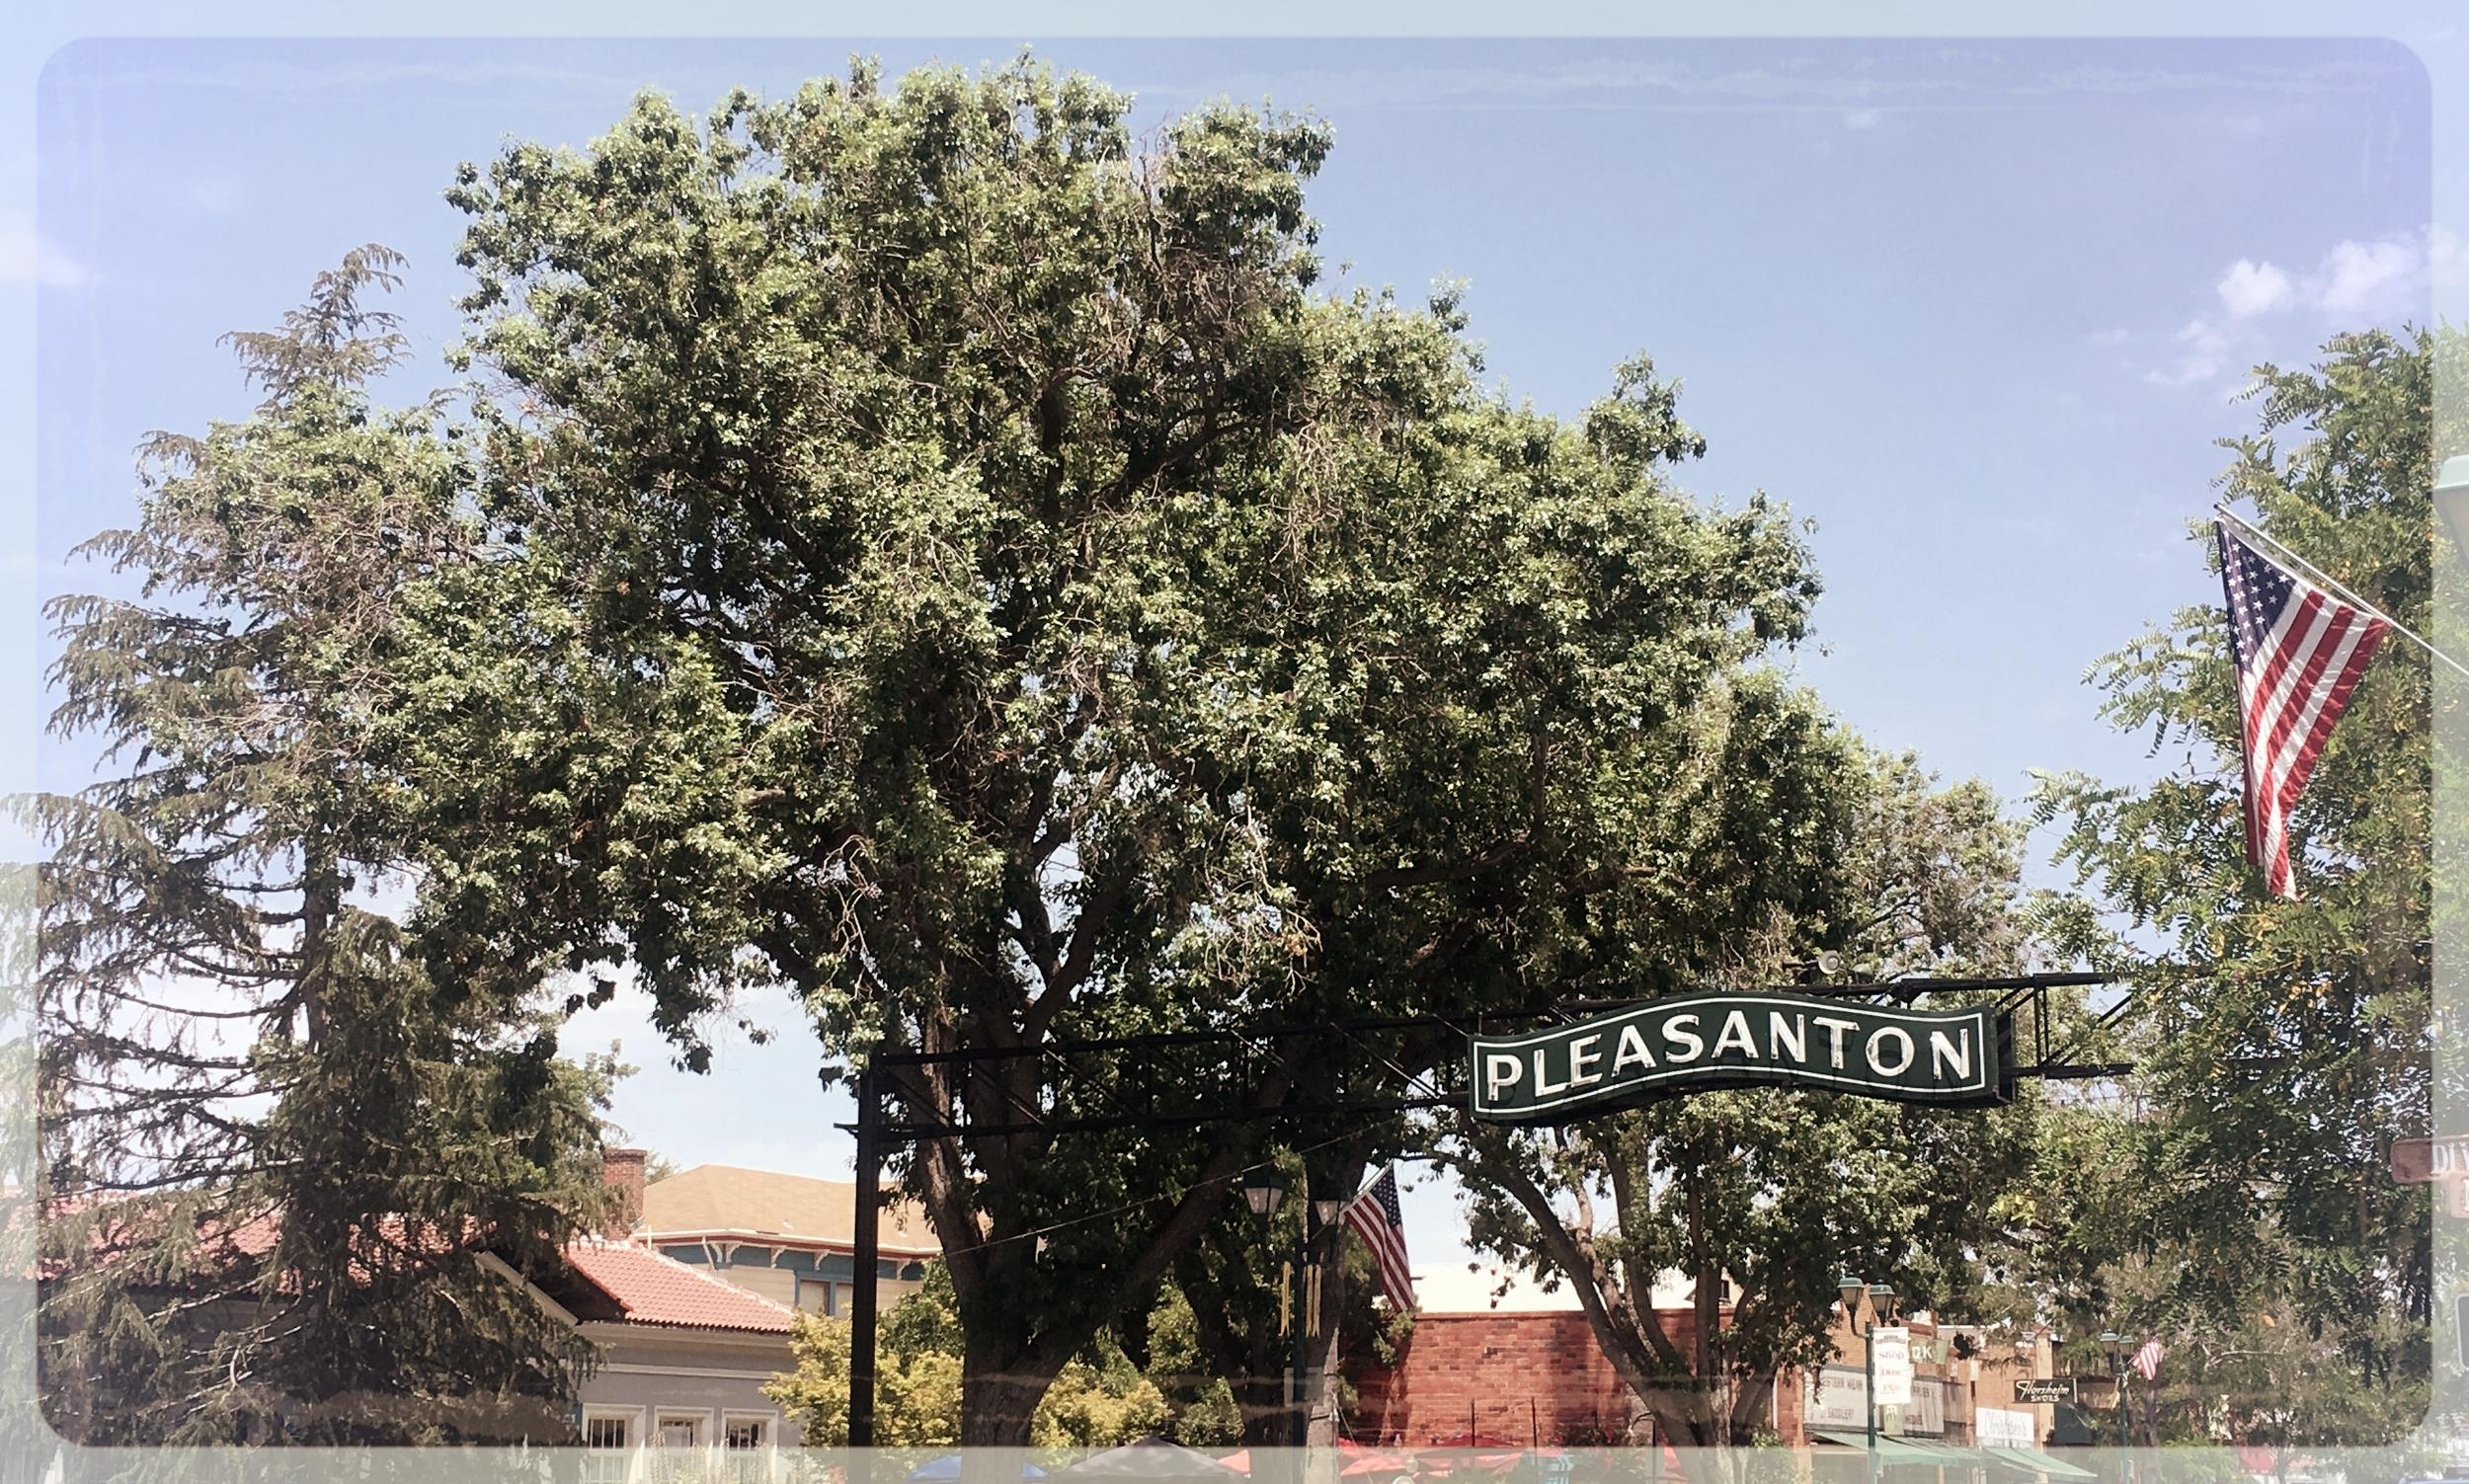 pleasanton-san-francisco.JPG